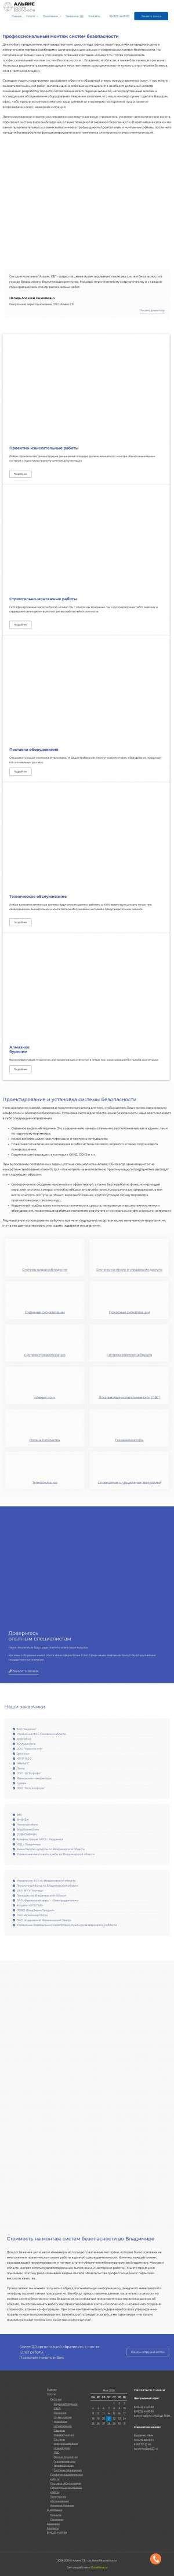 Предпросмотр для www.asb33.ru — Альянс-СБ